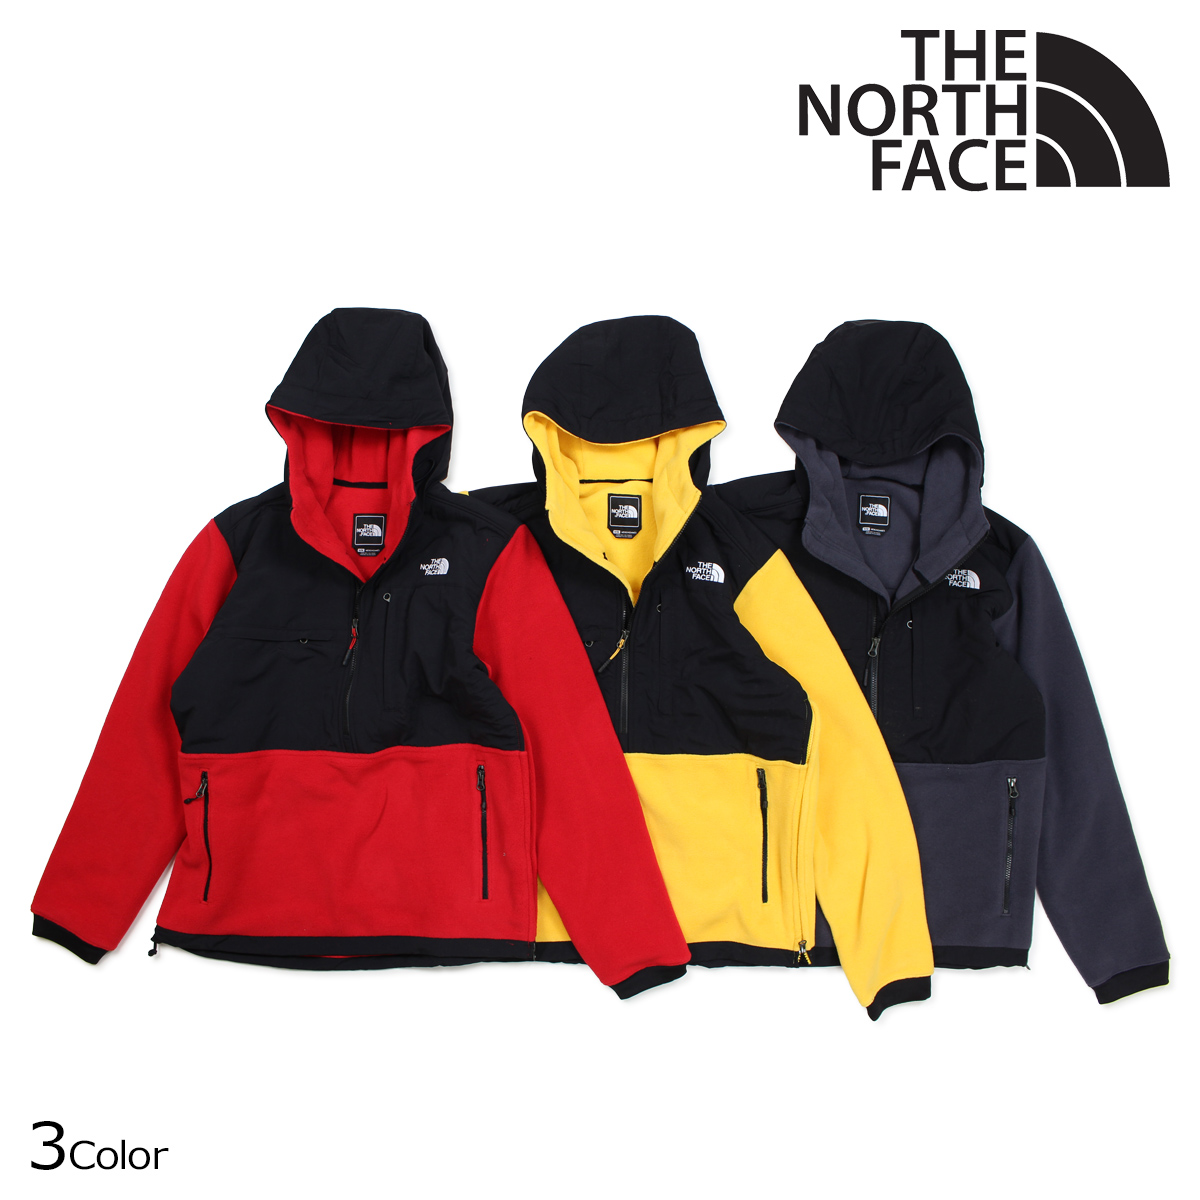 THE NORTH FACE MENS DENALI ANORAK ノースフェイス ジャケット デナリ アノラック マウンテンジャケット メンズ NF0A3MMT